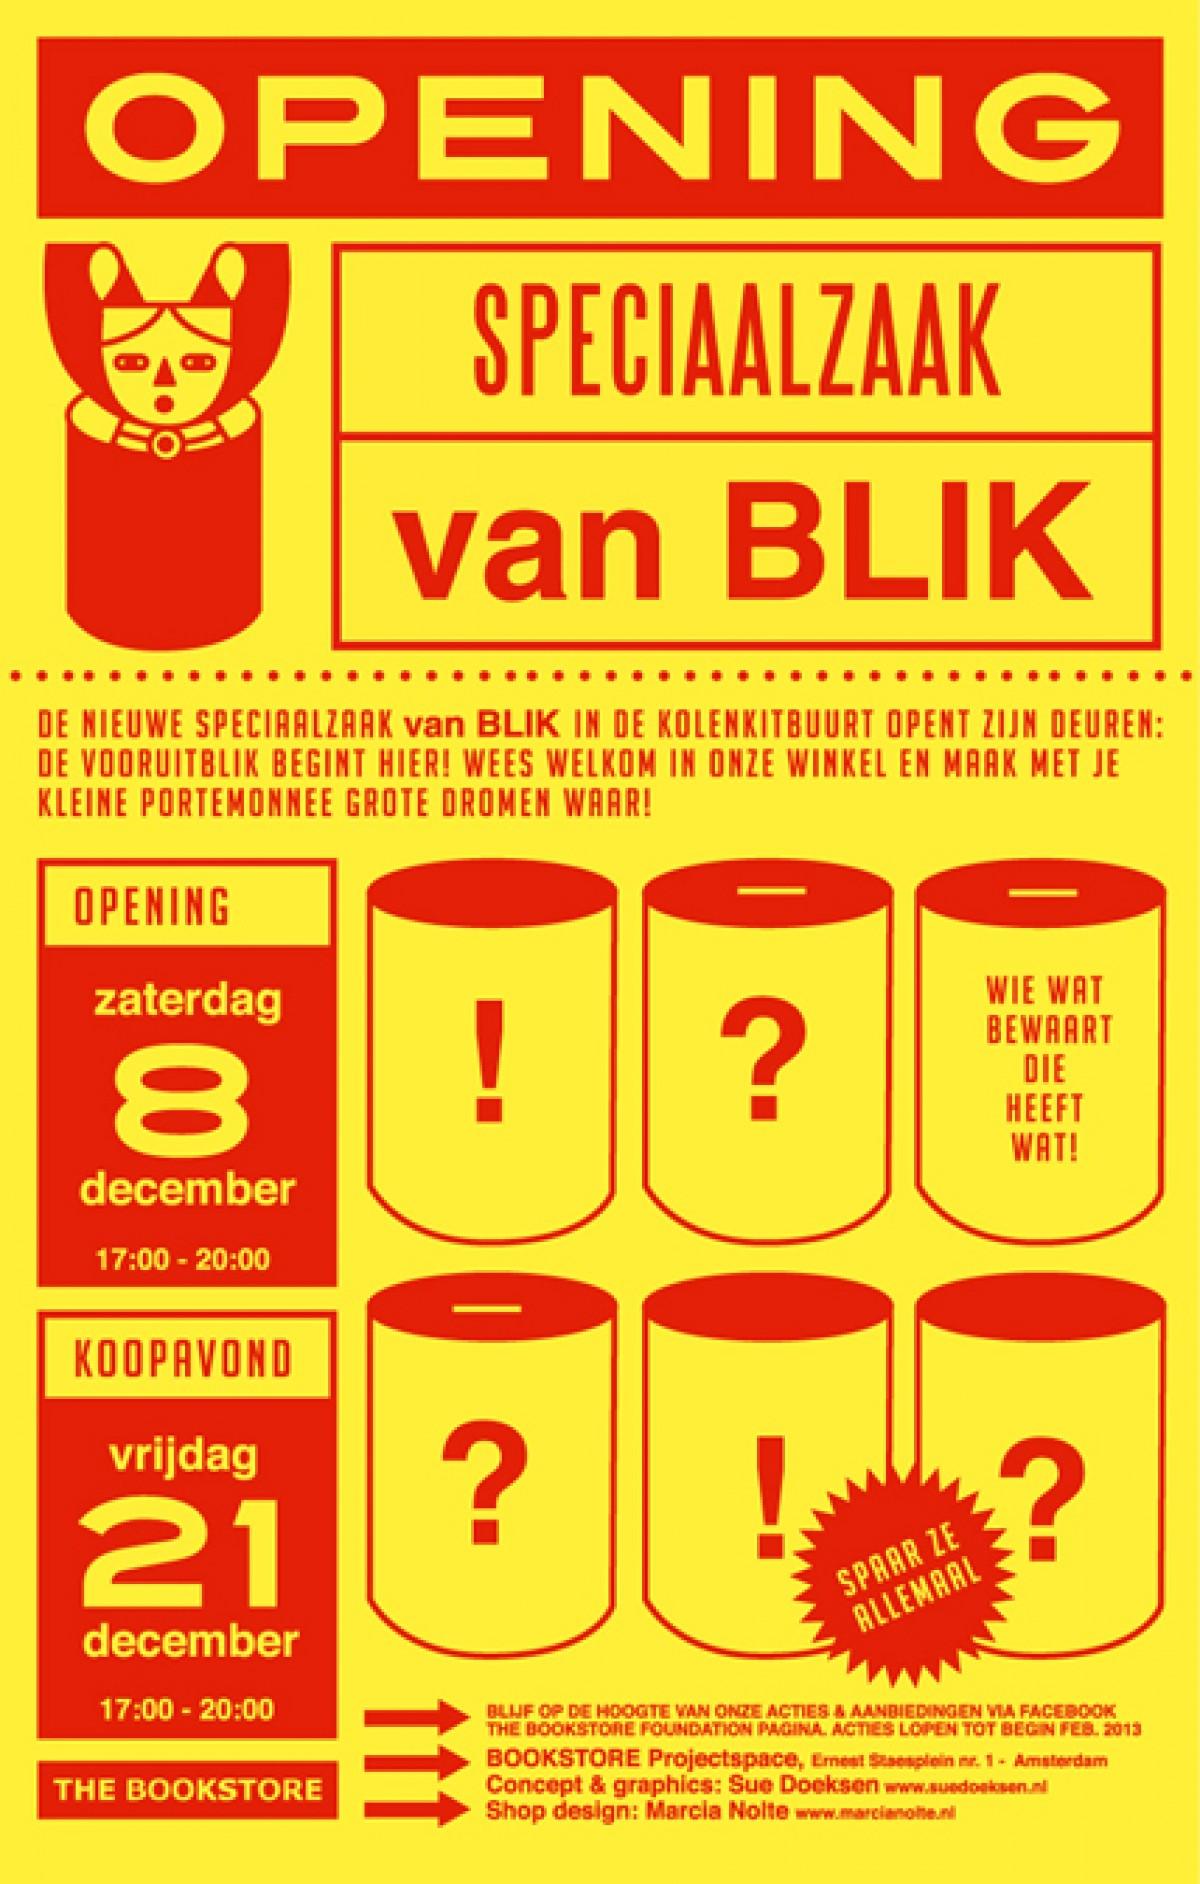 VAN BLIK